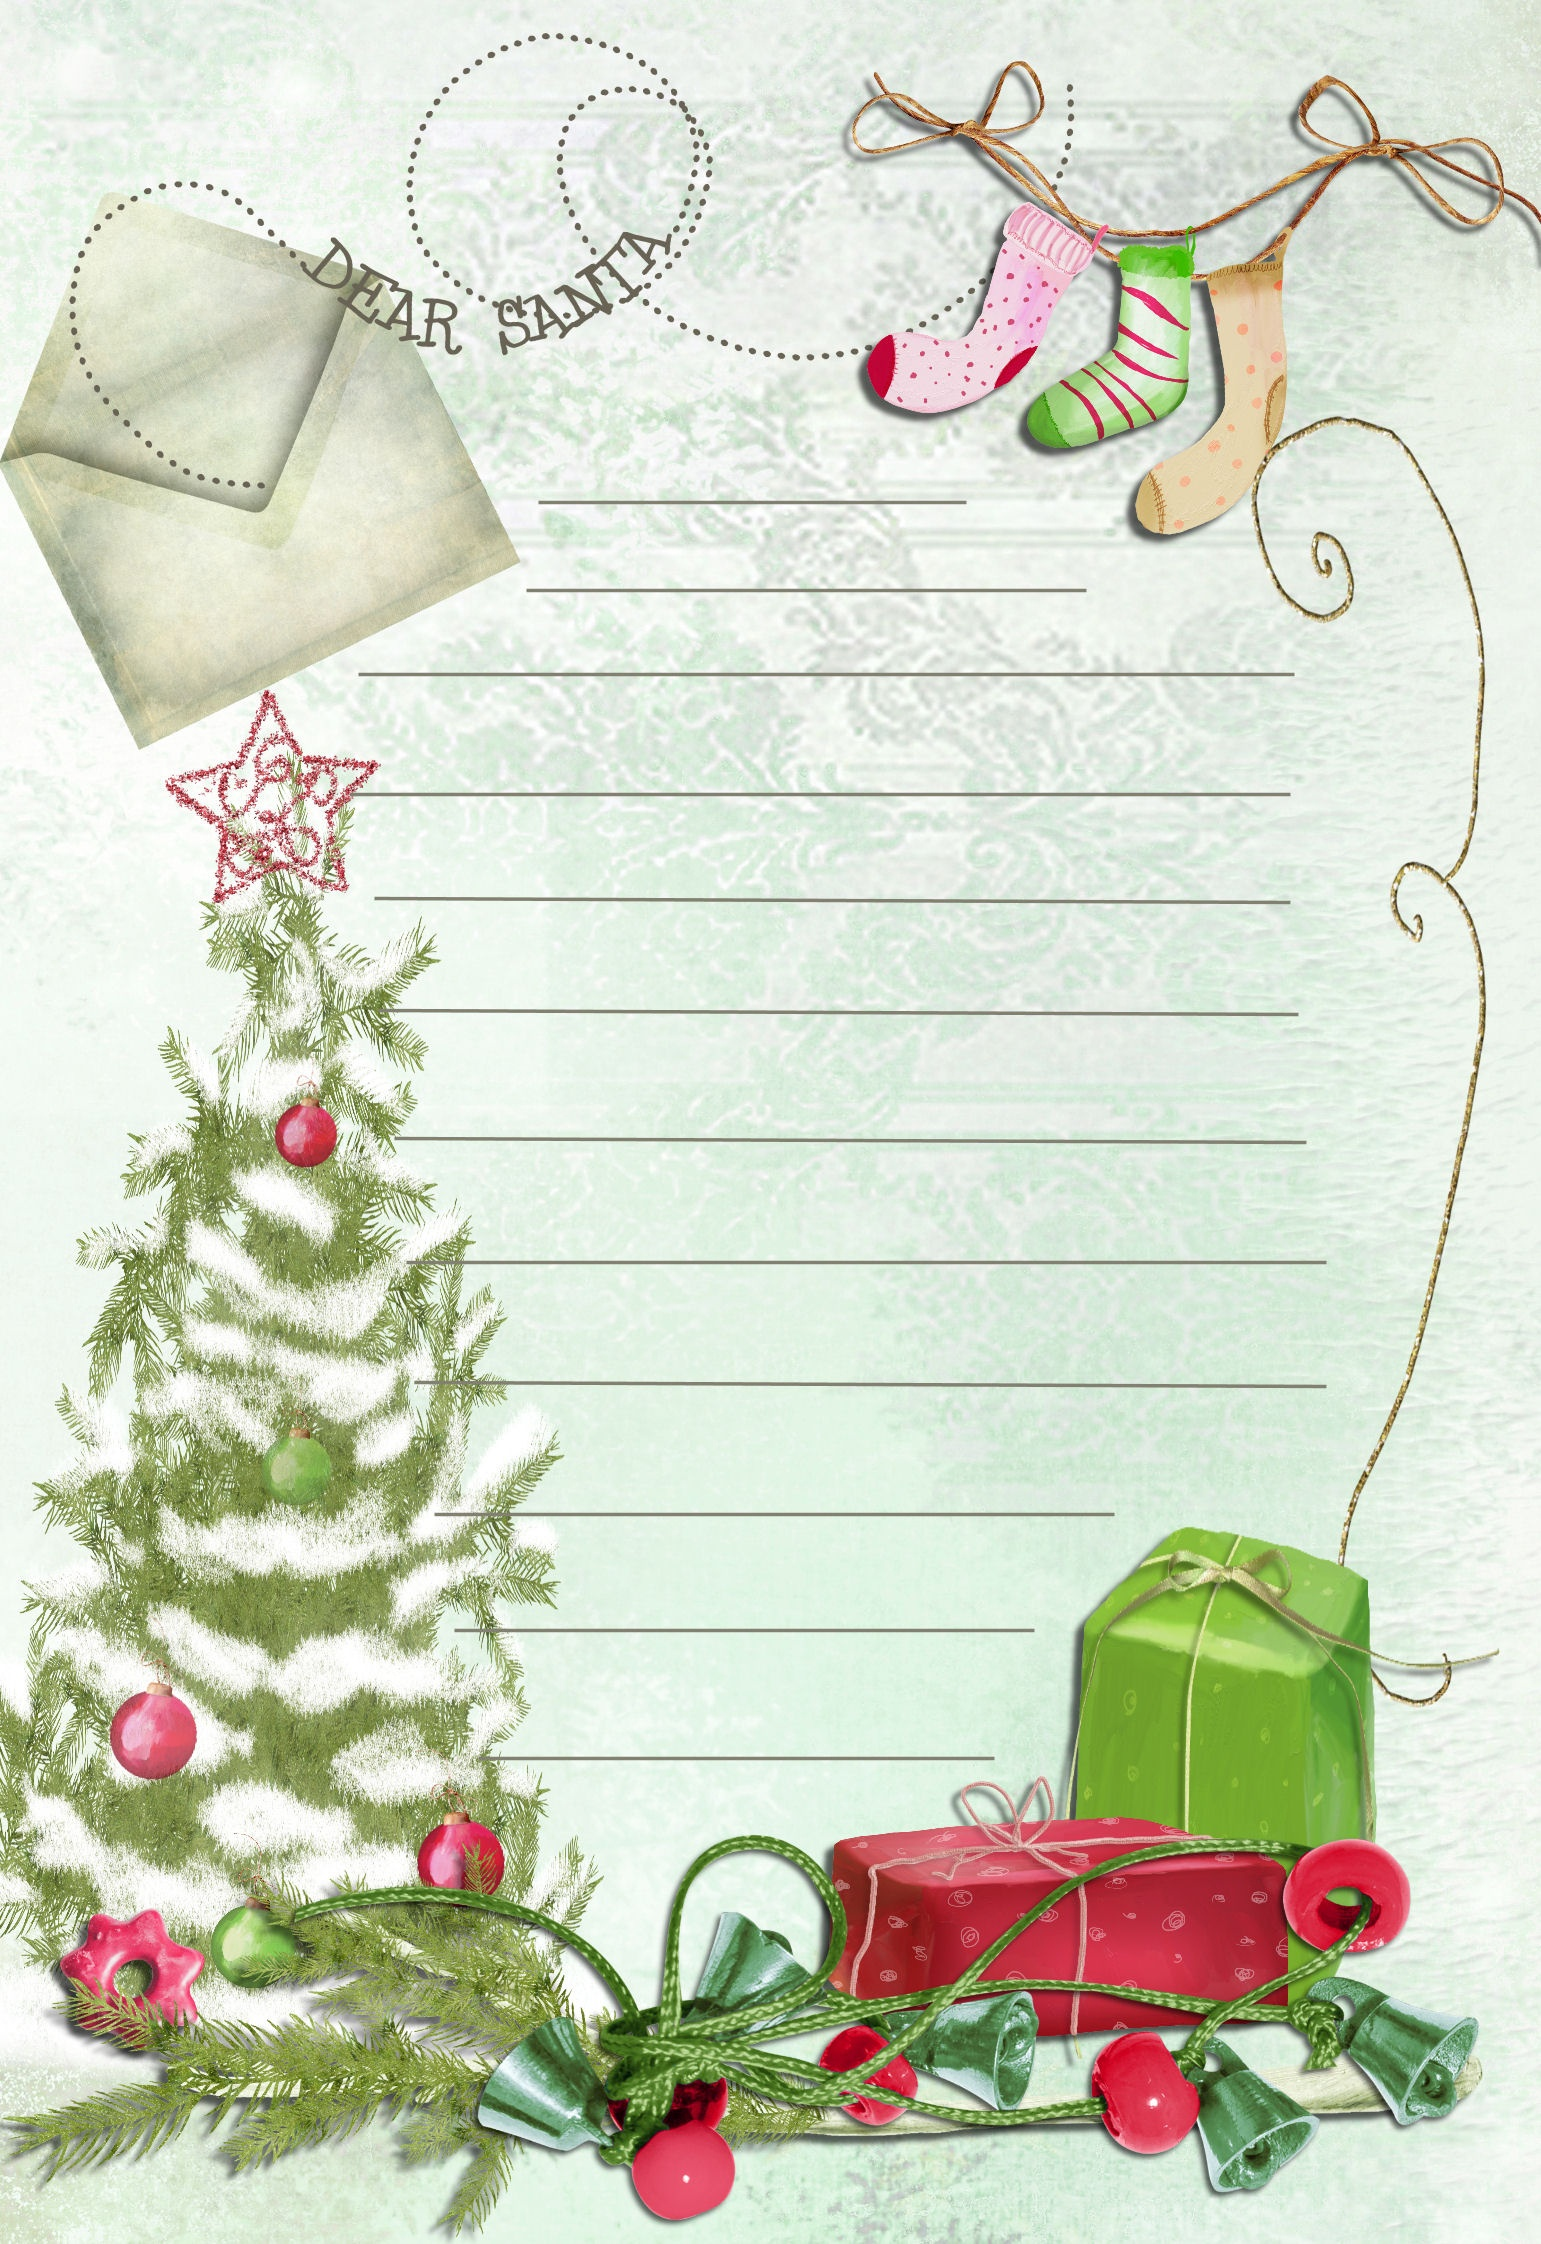 19 Free Printable Christmas Letter Templates Images - Free Printable - Free Printable Christmas Letters